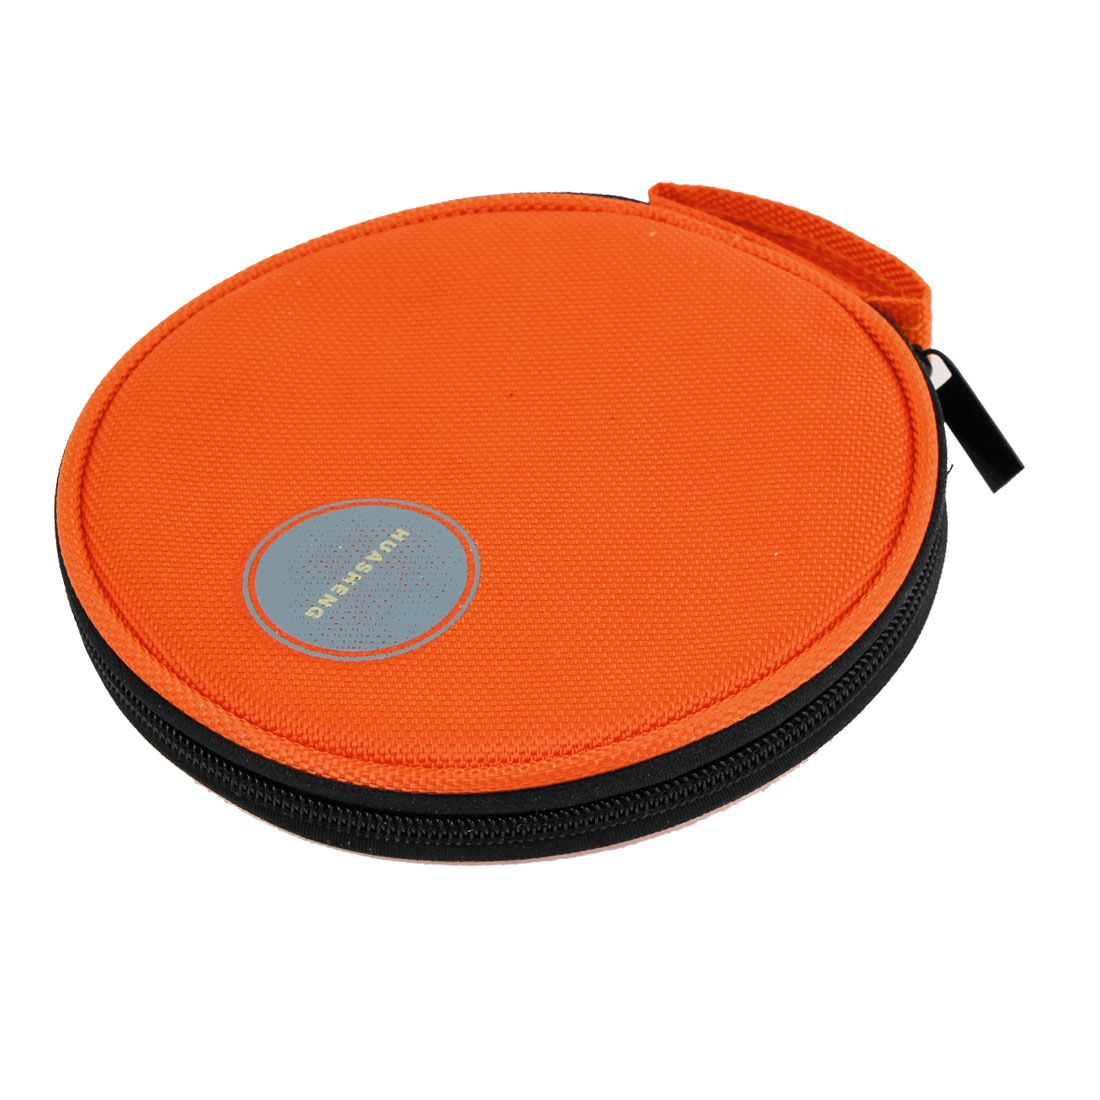 Universal Zipper Orange Oxford Fabric 20 Capacity VCD DVD CD Holder Bag Wallet